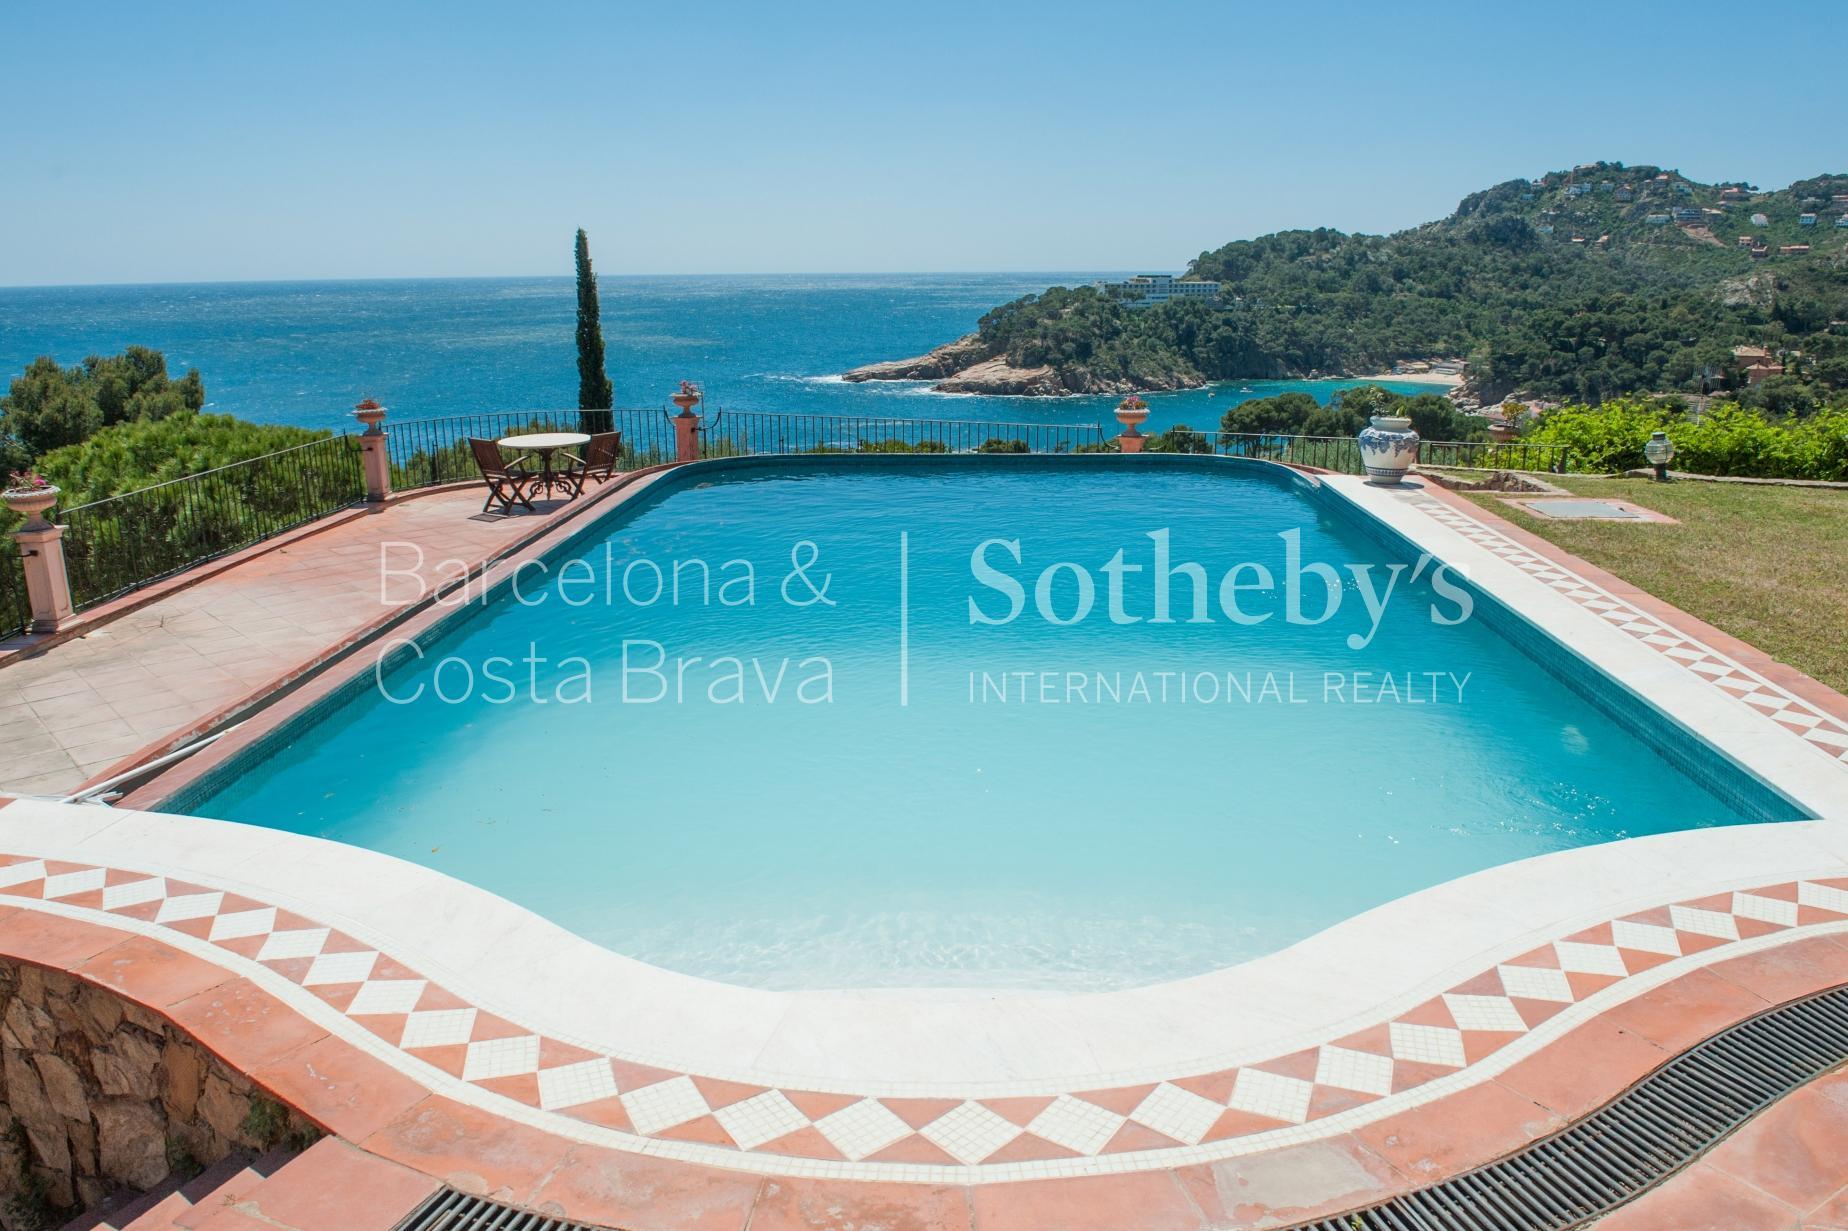 Single Family Home for Sale at Mediterranean villa with stunning views to Aiguablava Begur, Costa Brava 17255 Spain